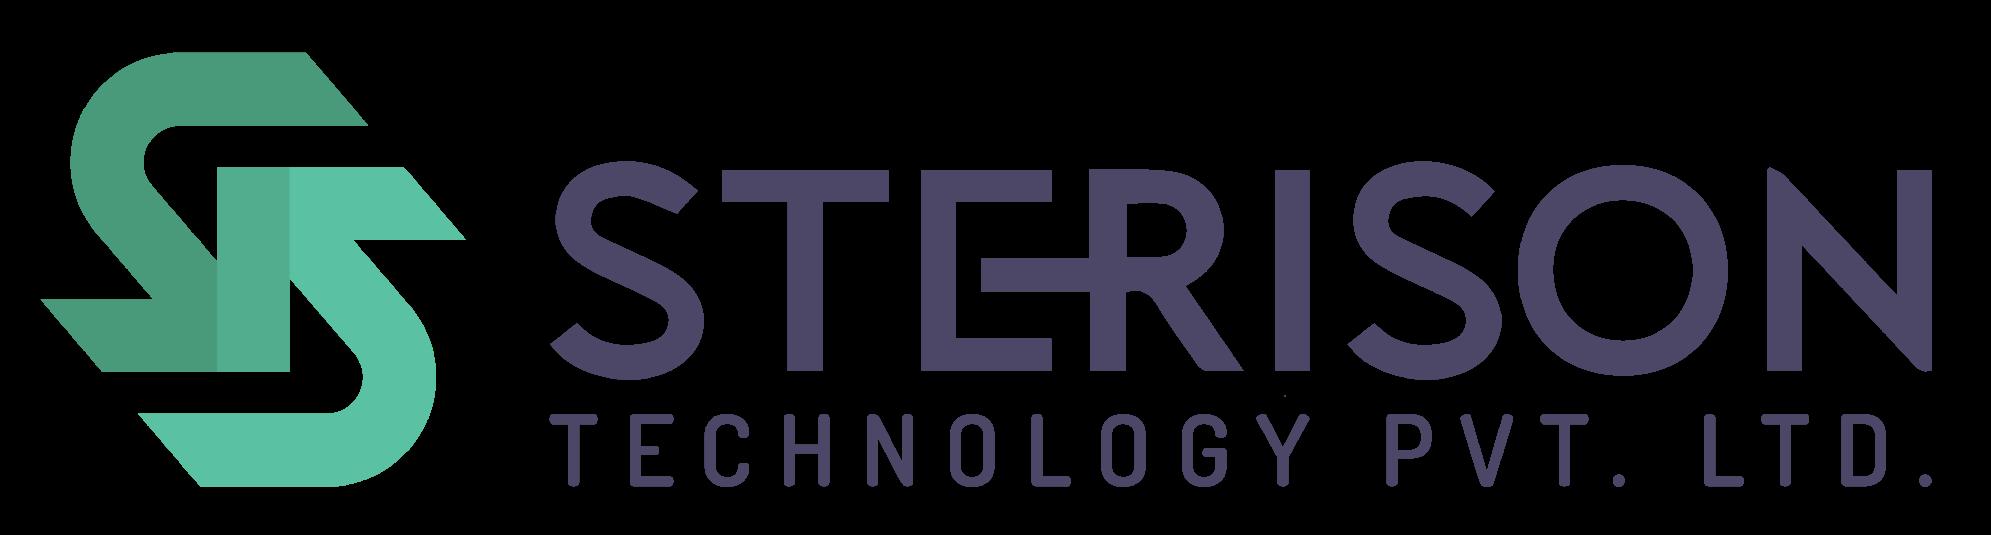 sterison logo